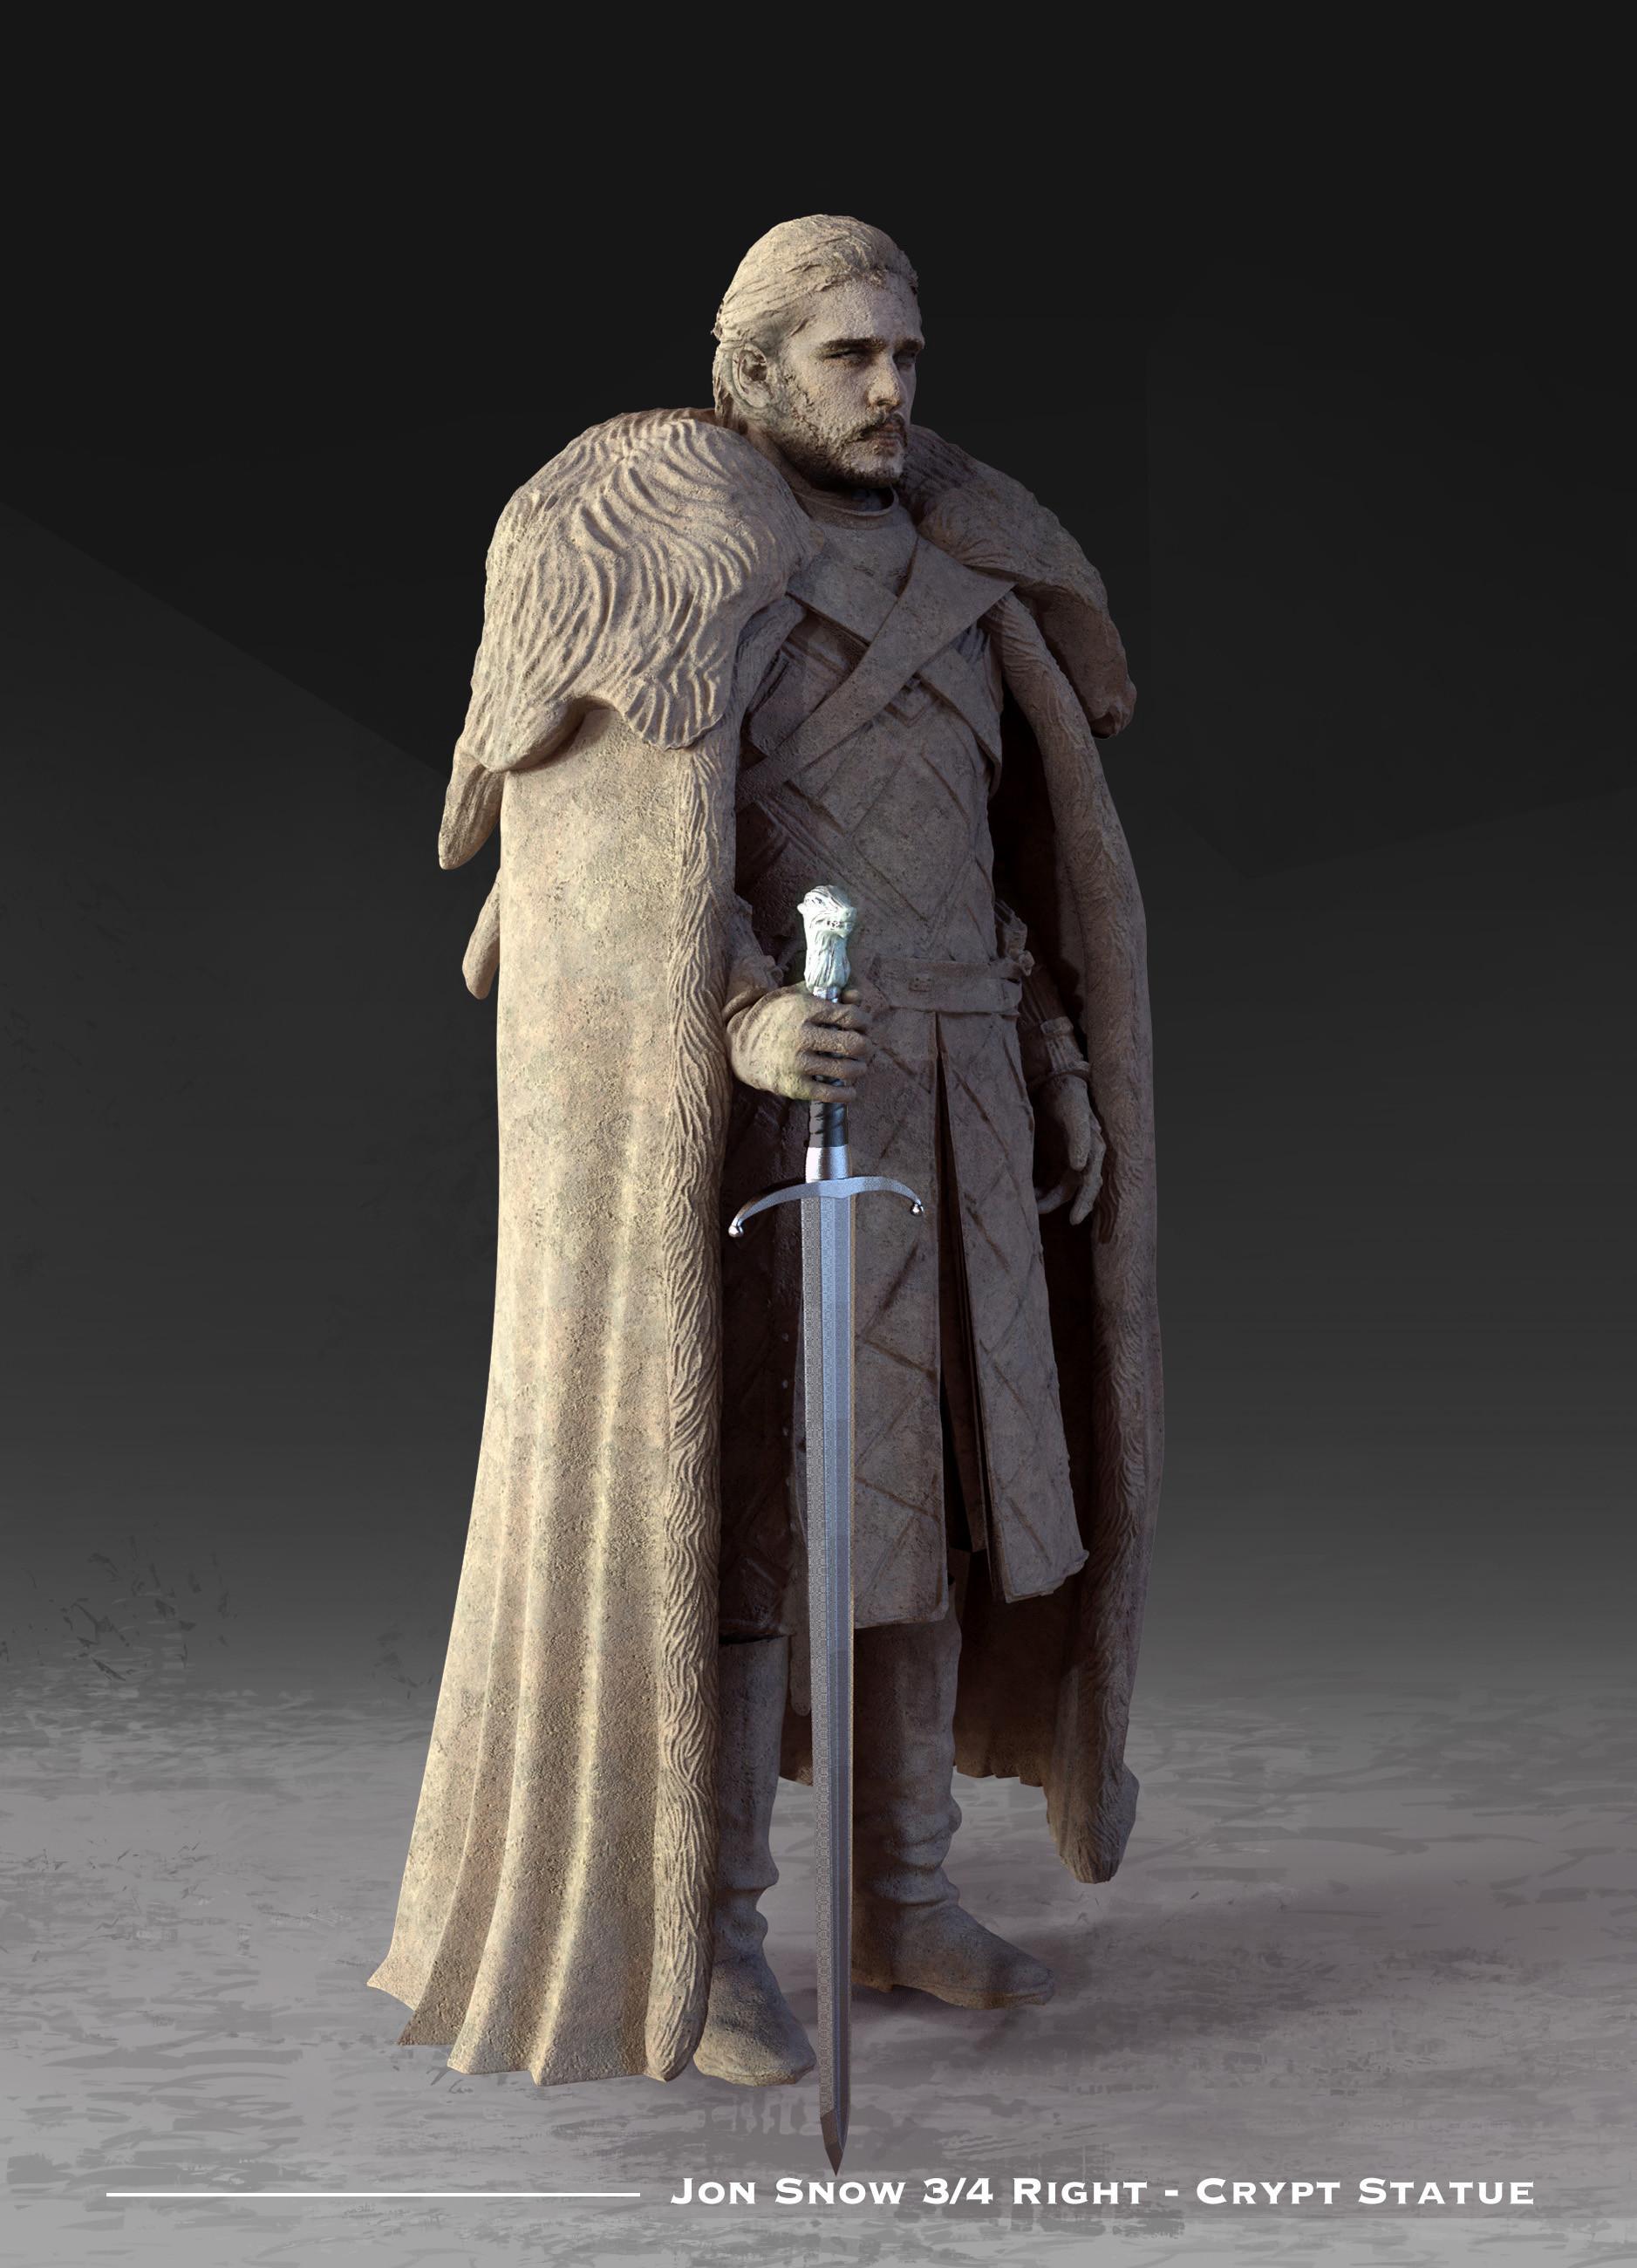 Kieran belshaw jon statue 3quarterright v001